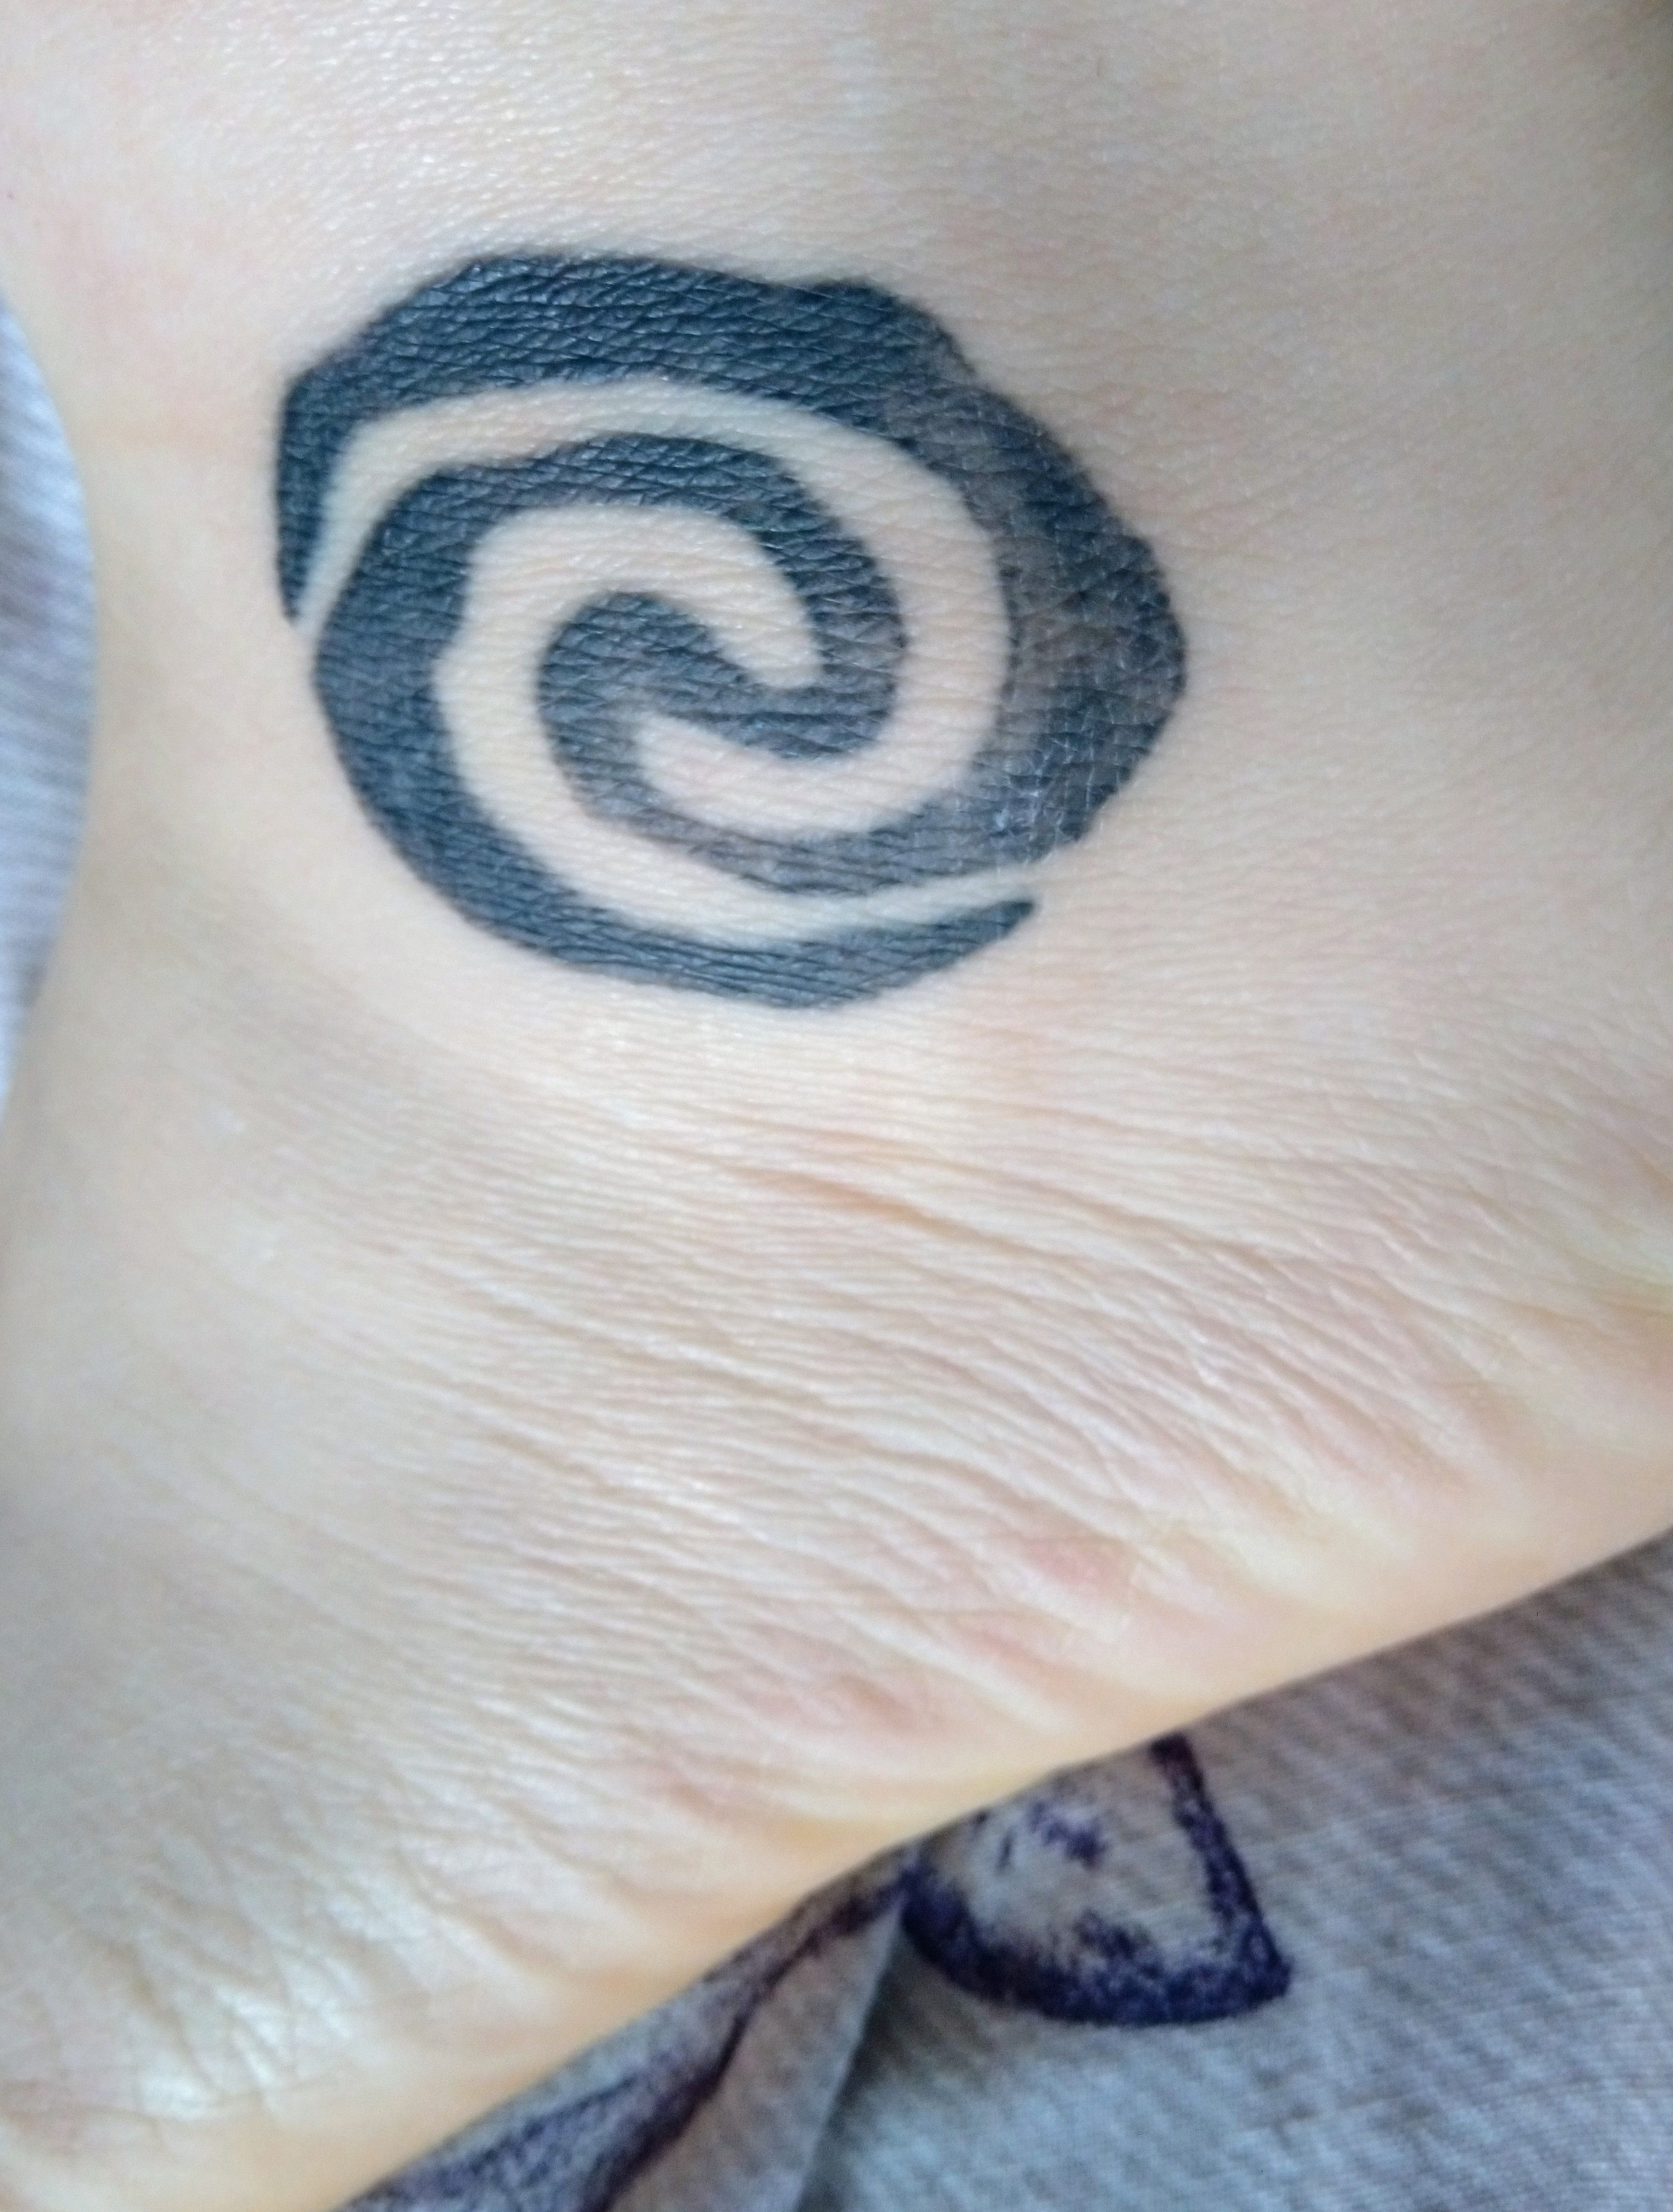 Moana Heart Of Te Fiti Tattoo Disney Tattoos Disney Tattoos Small Moana Tattoos